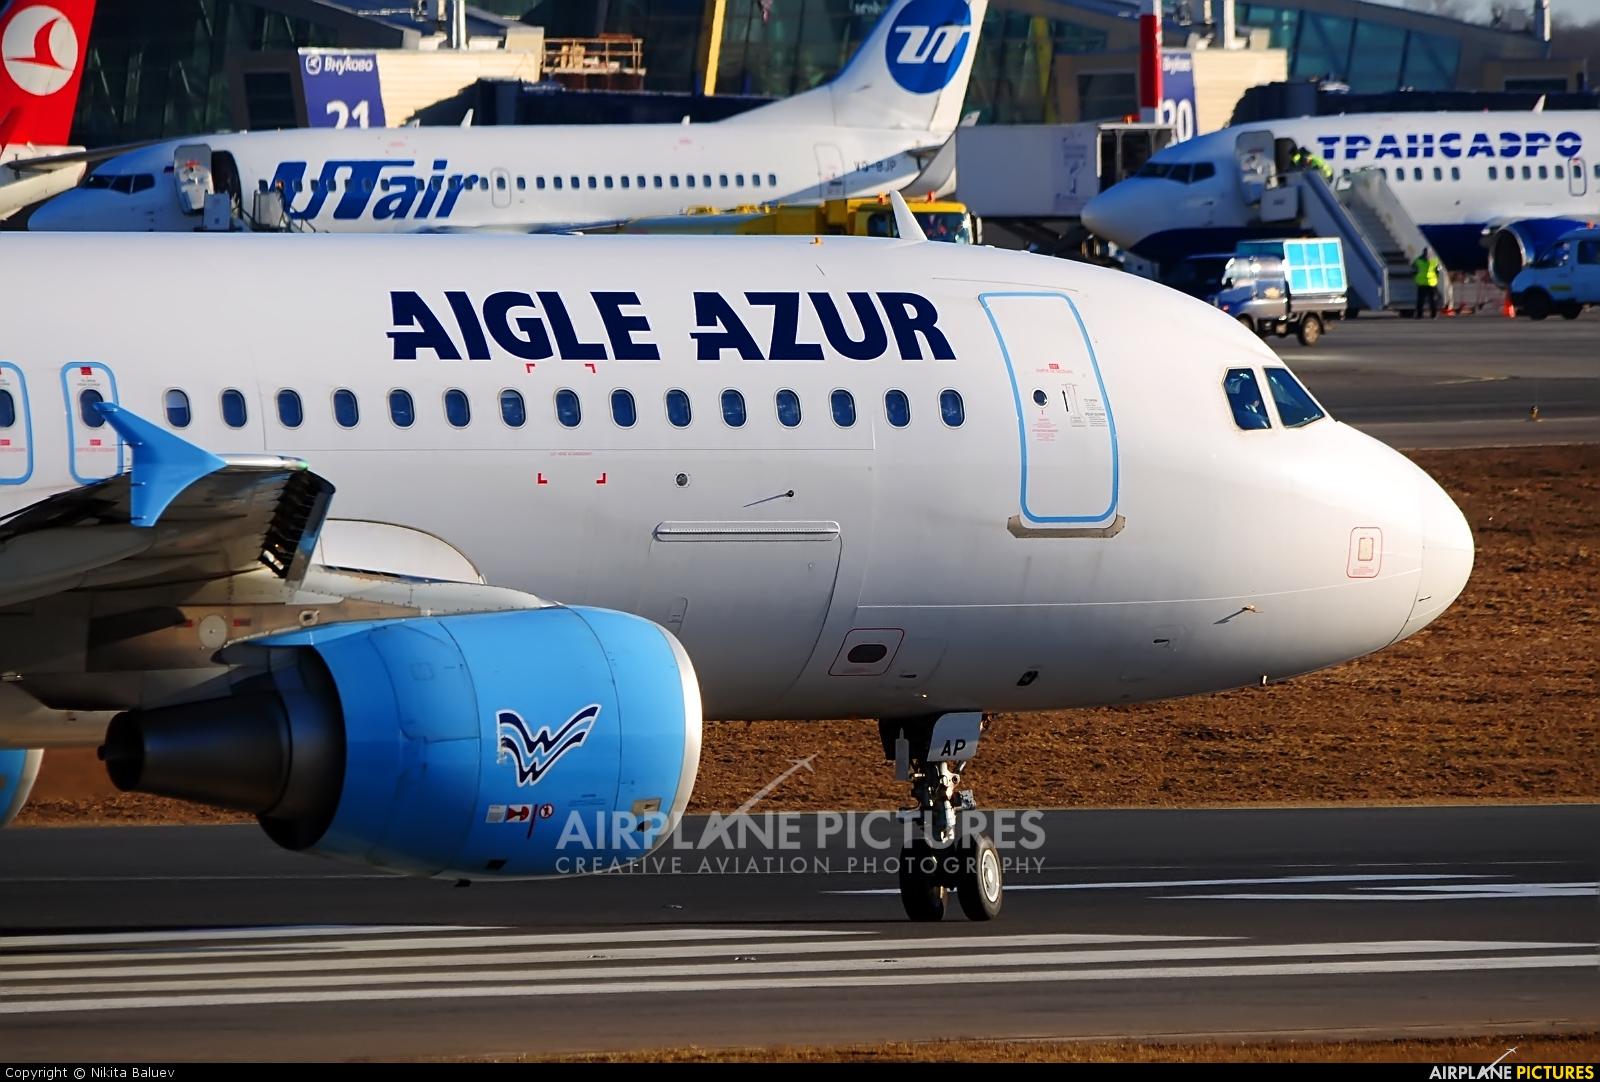 Aigle Azur F-HBAP aircraft at Moscow - Vnukovo